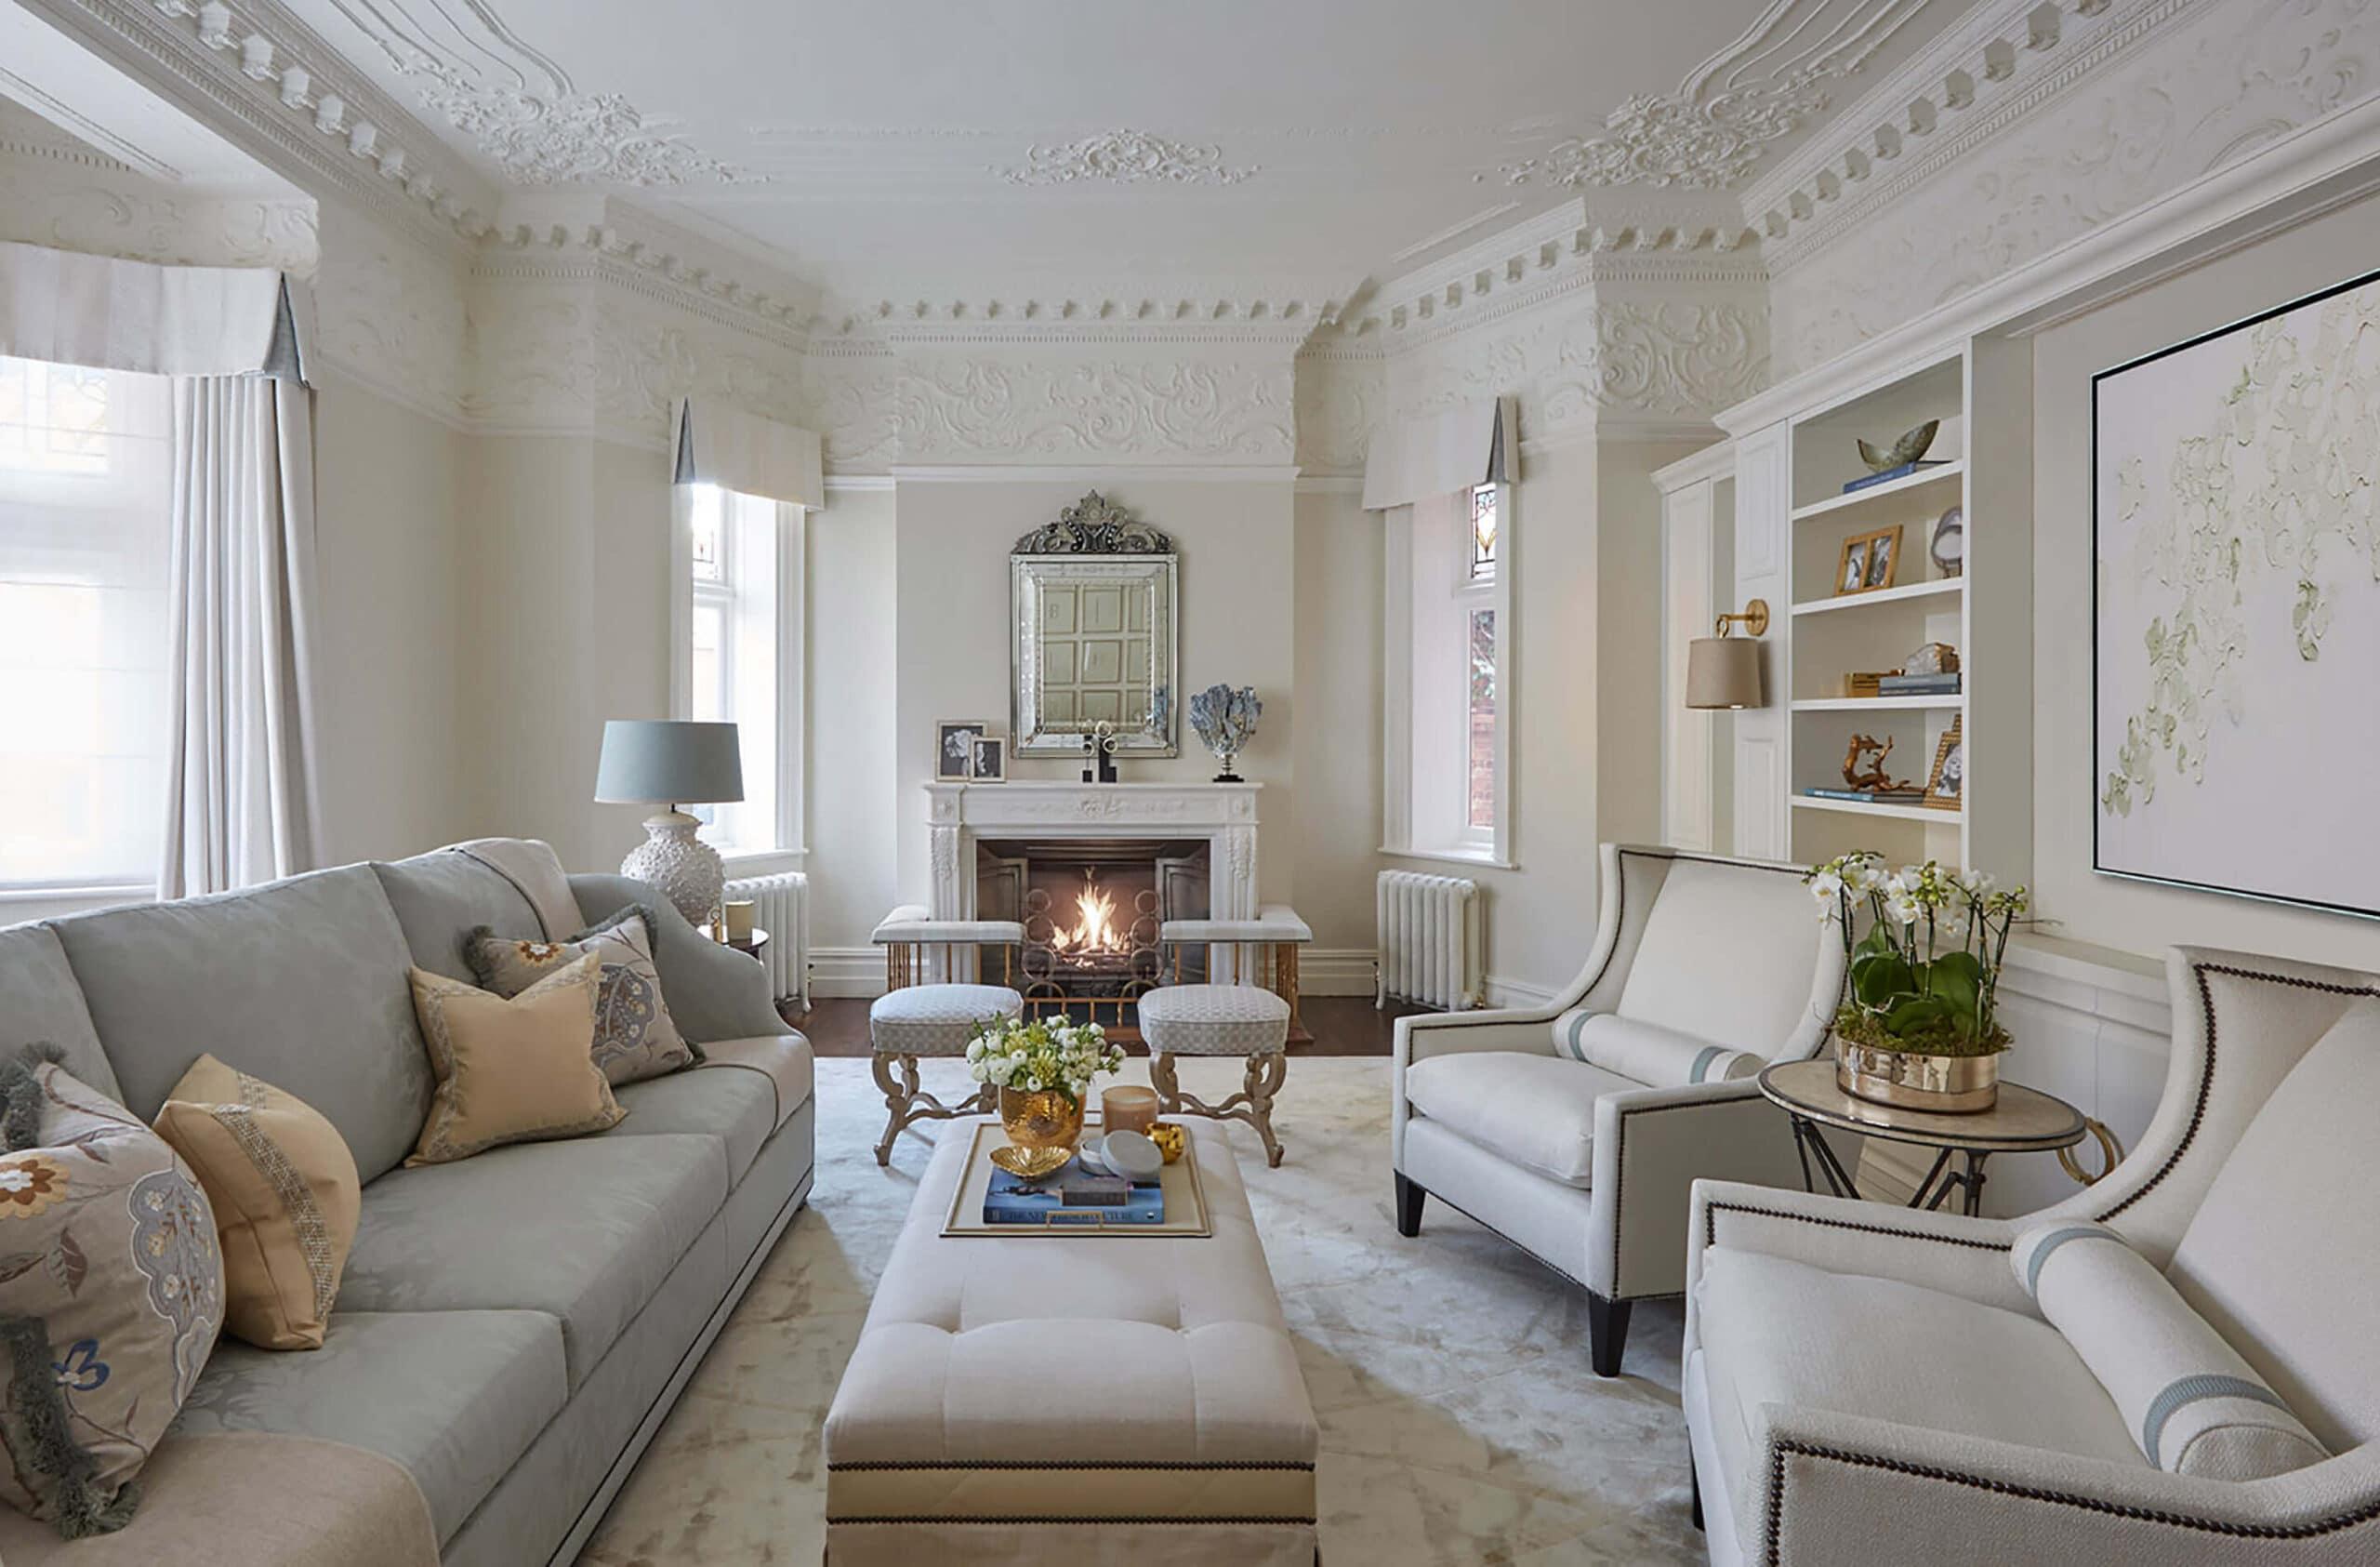 Luxury family home interior designer